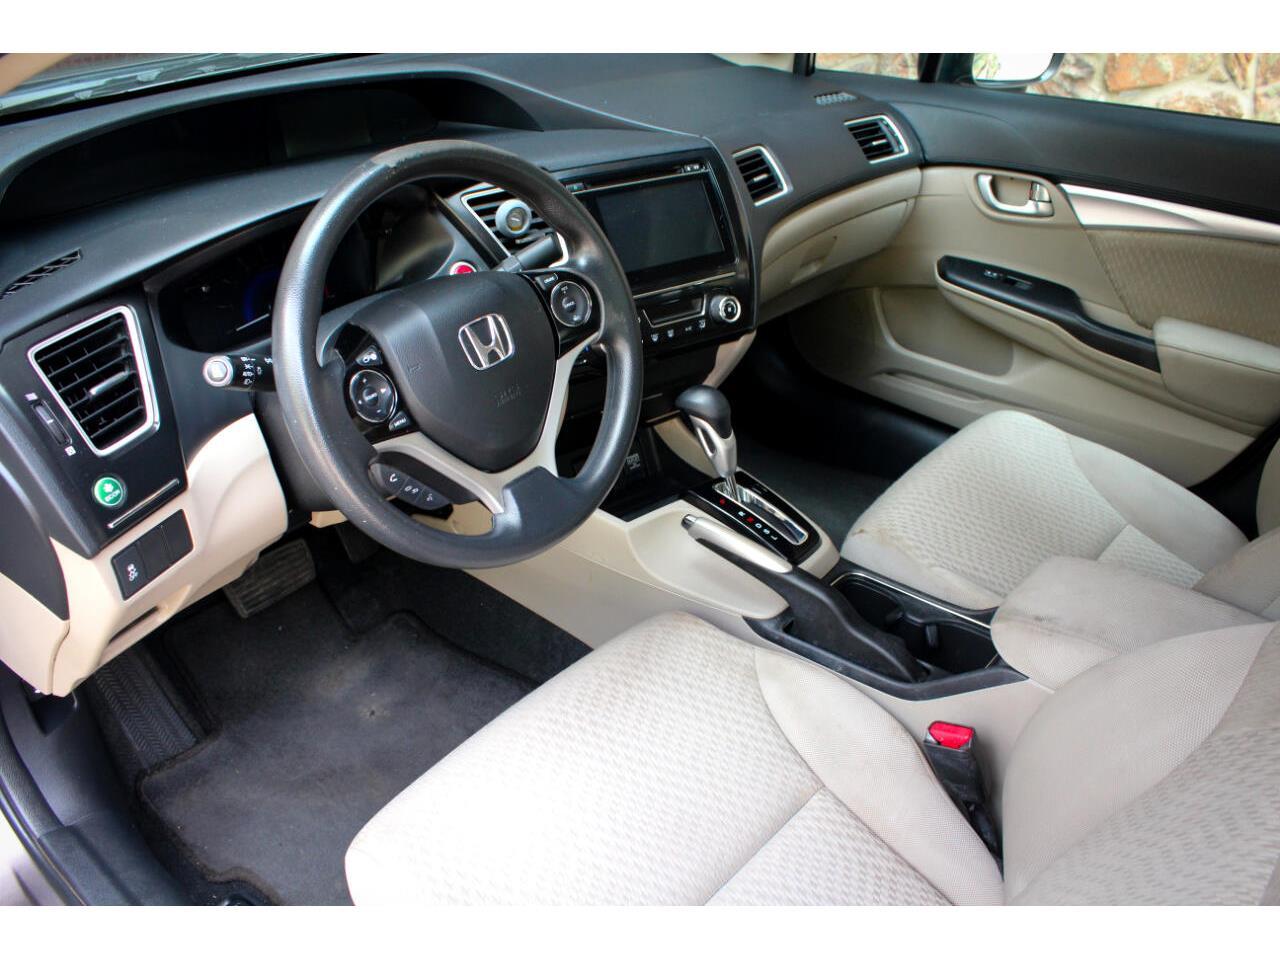 2014 Honda Civic (CC-1380615) for sale in Greeley, Colorado